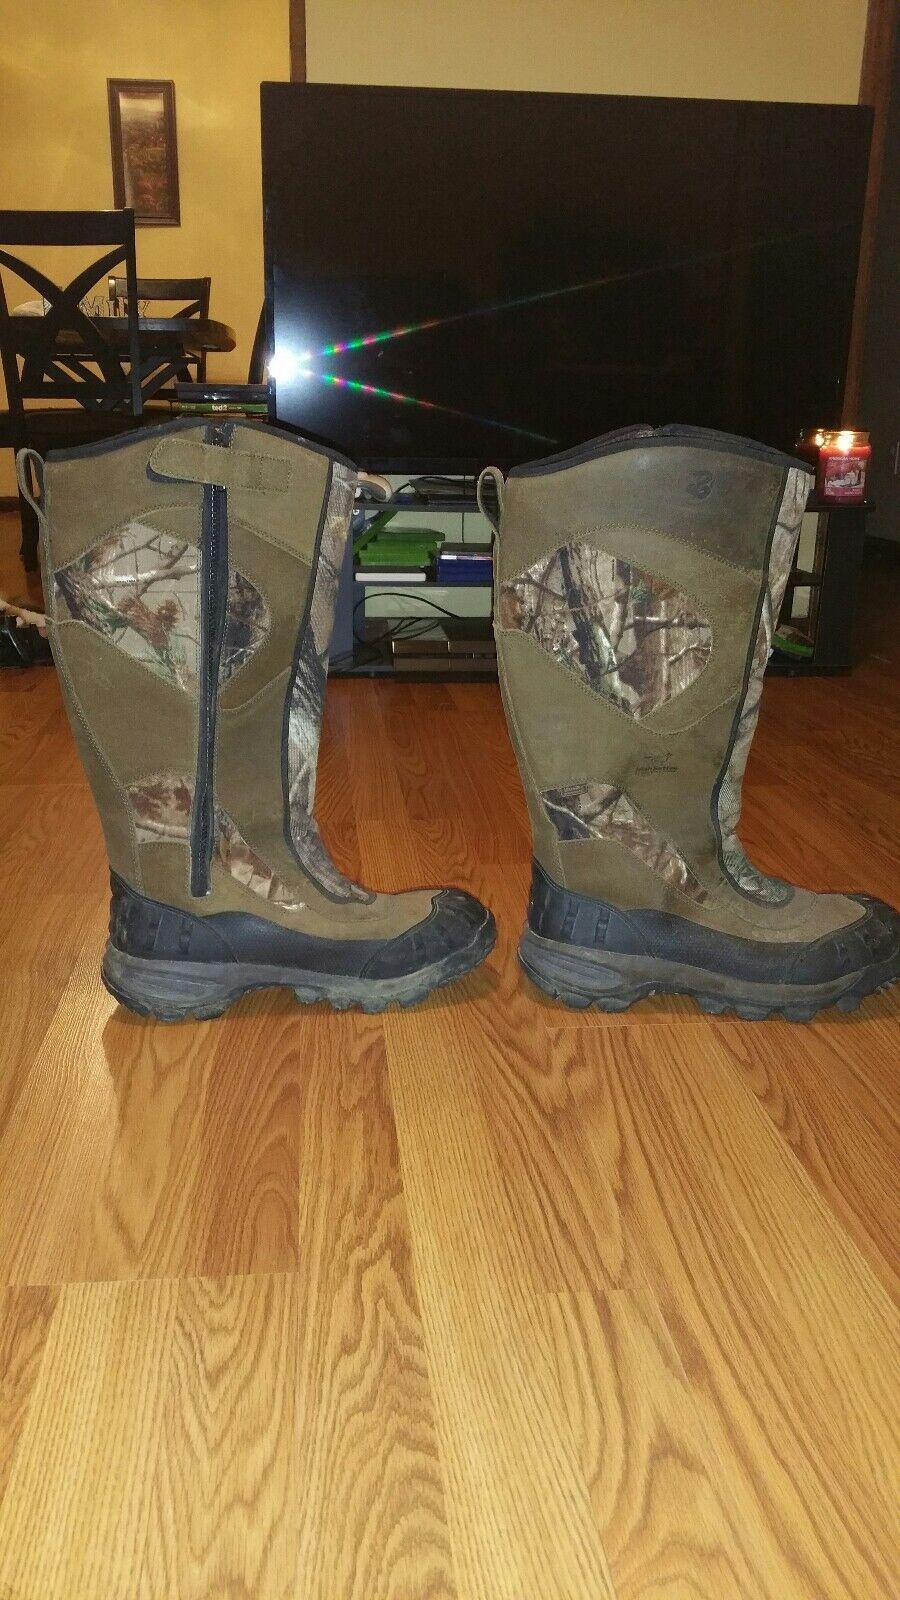 Irish Setter UltraDry SnakeGuard Boots